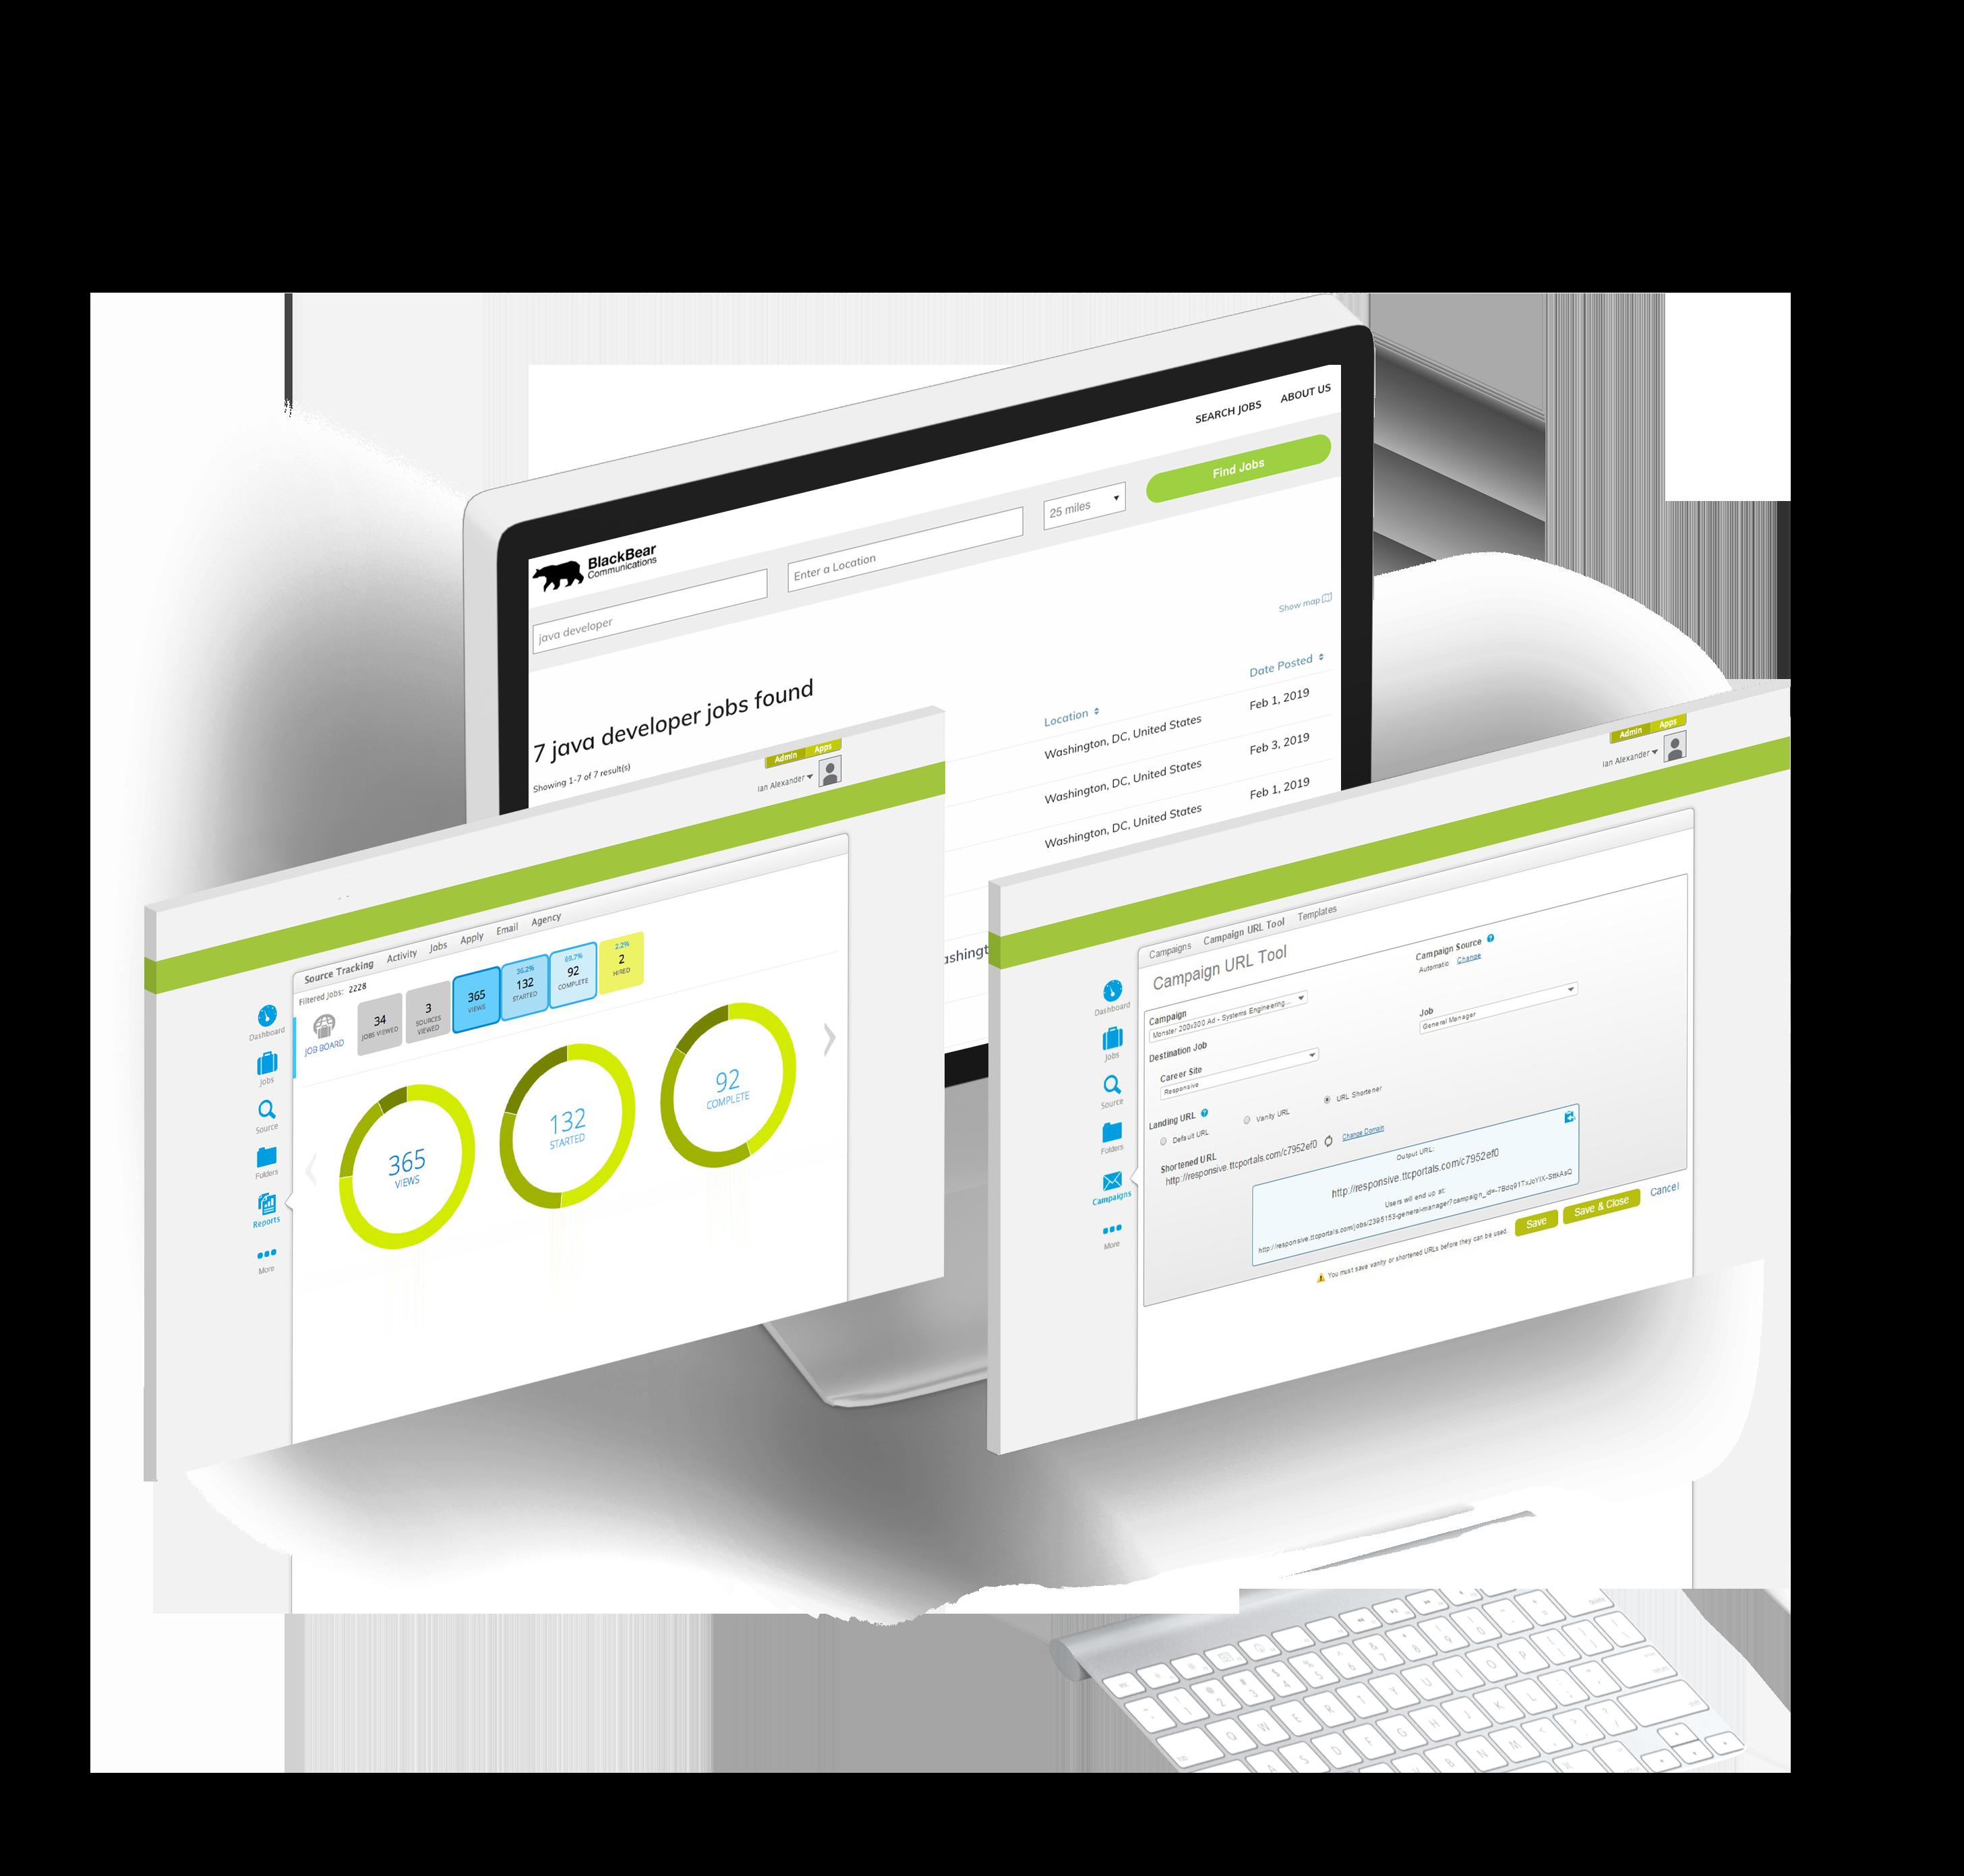 Enterprise recruitment marketing platform